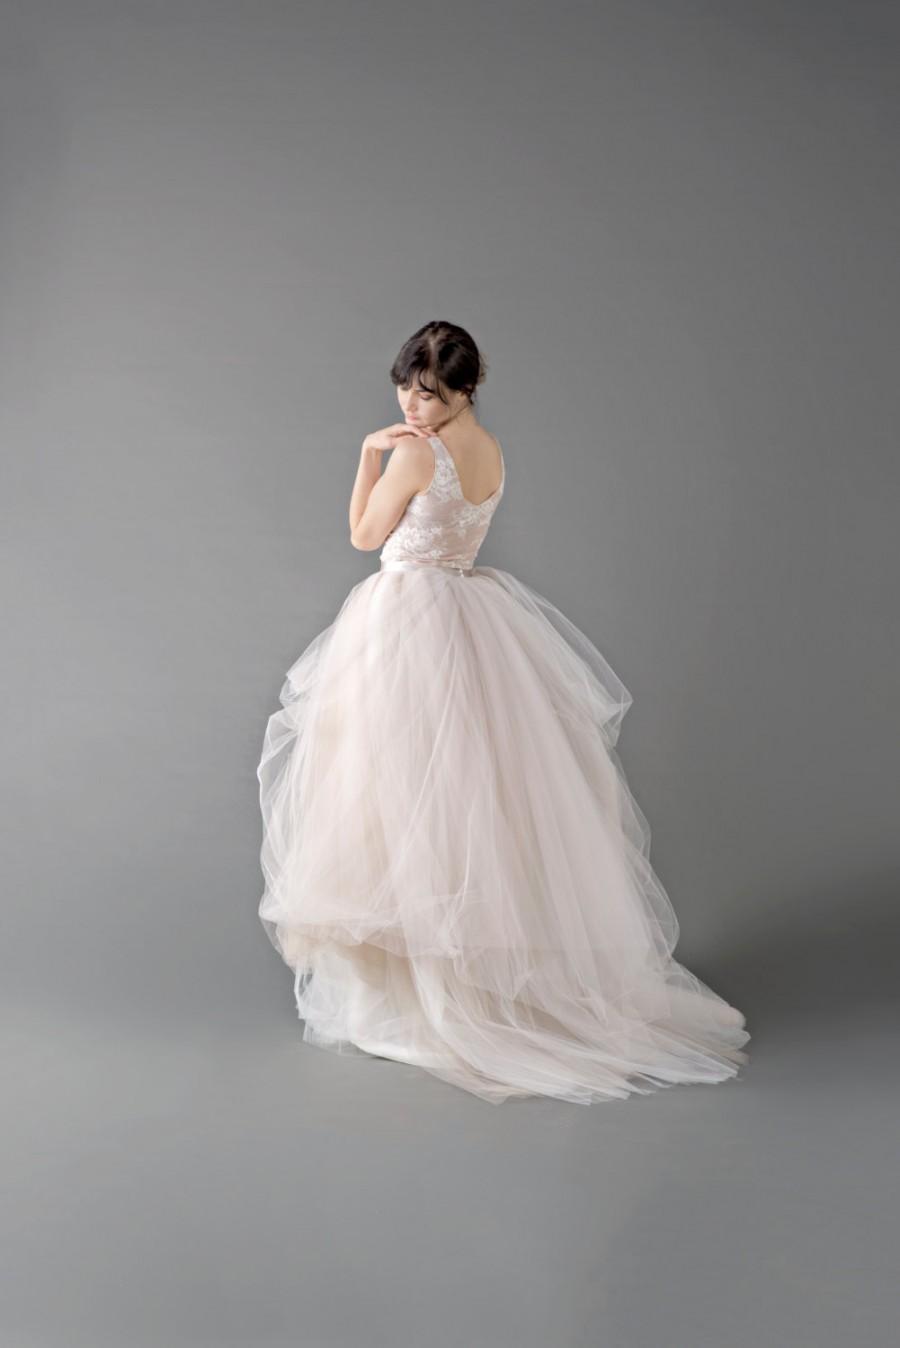 Tulle Skirt Wedding Gown 19